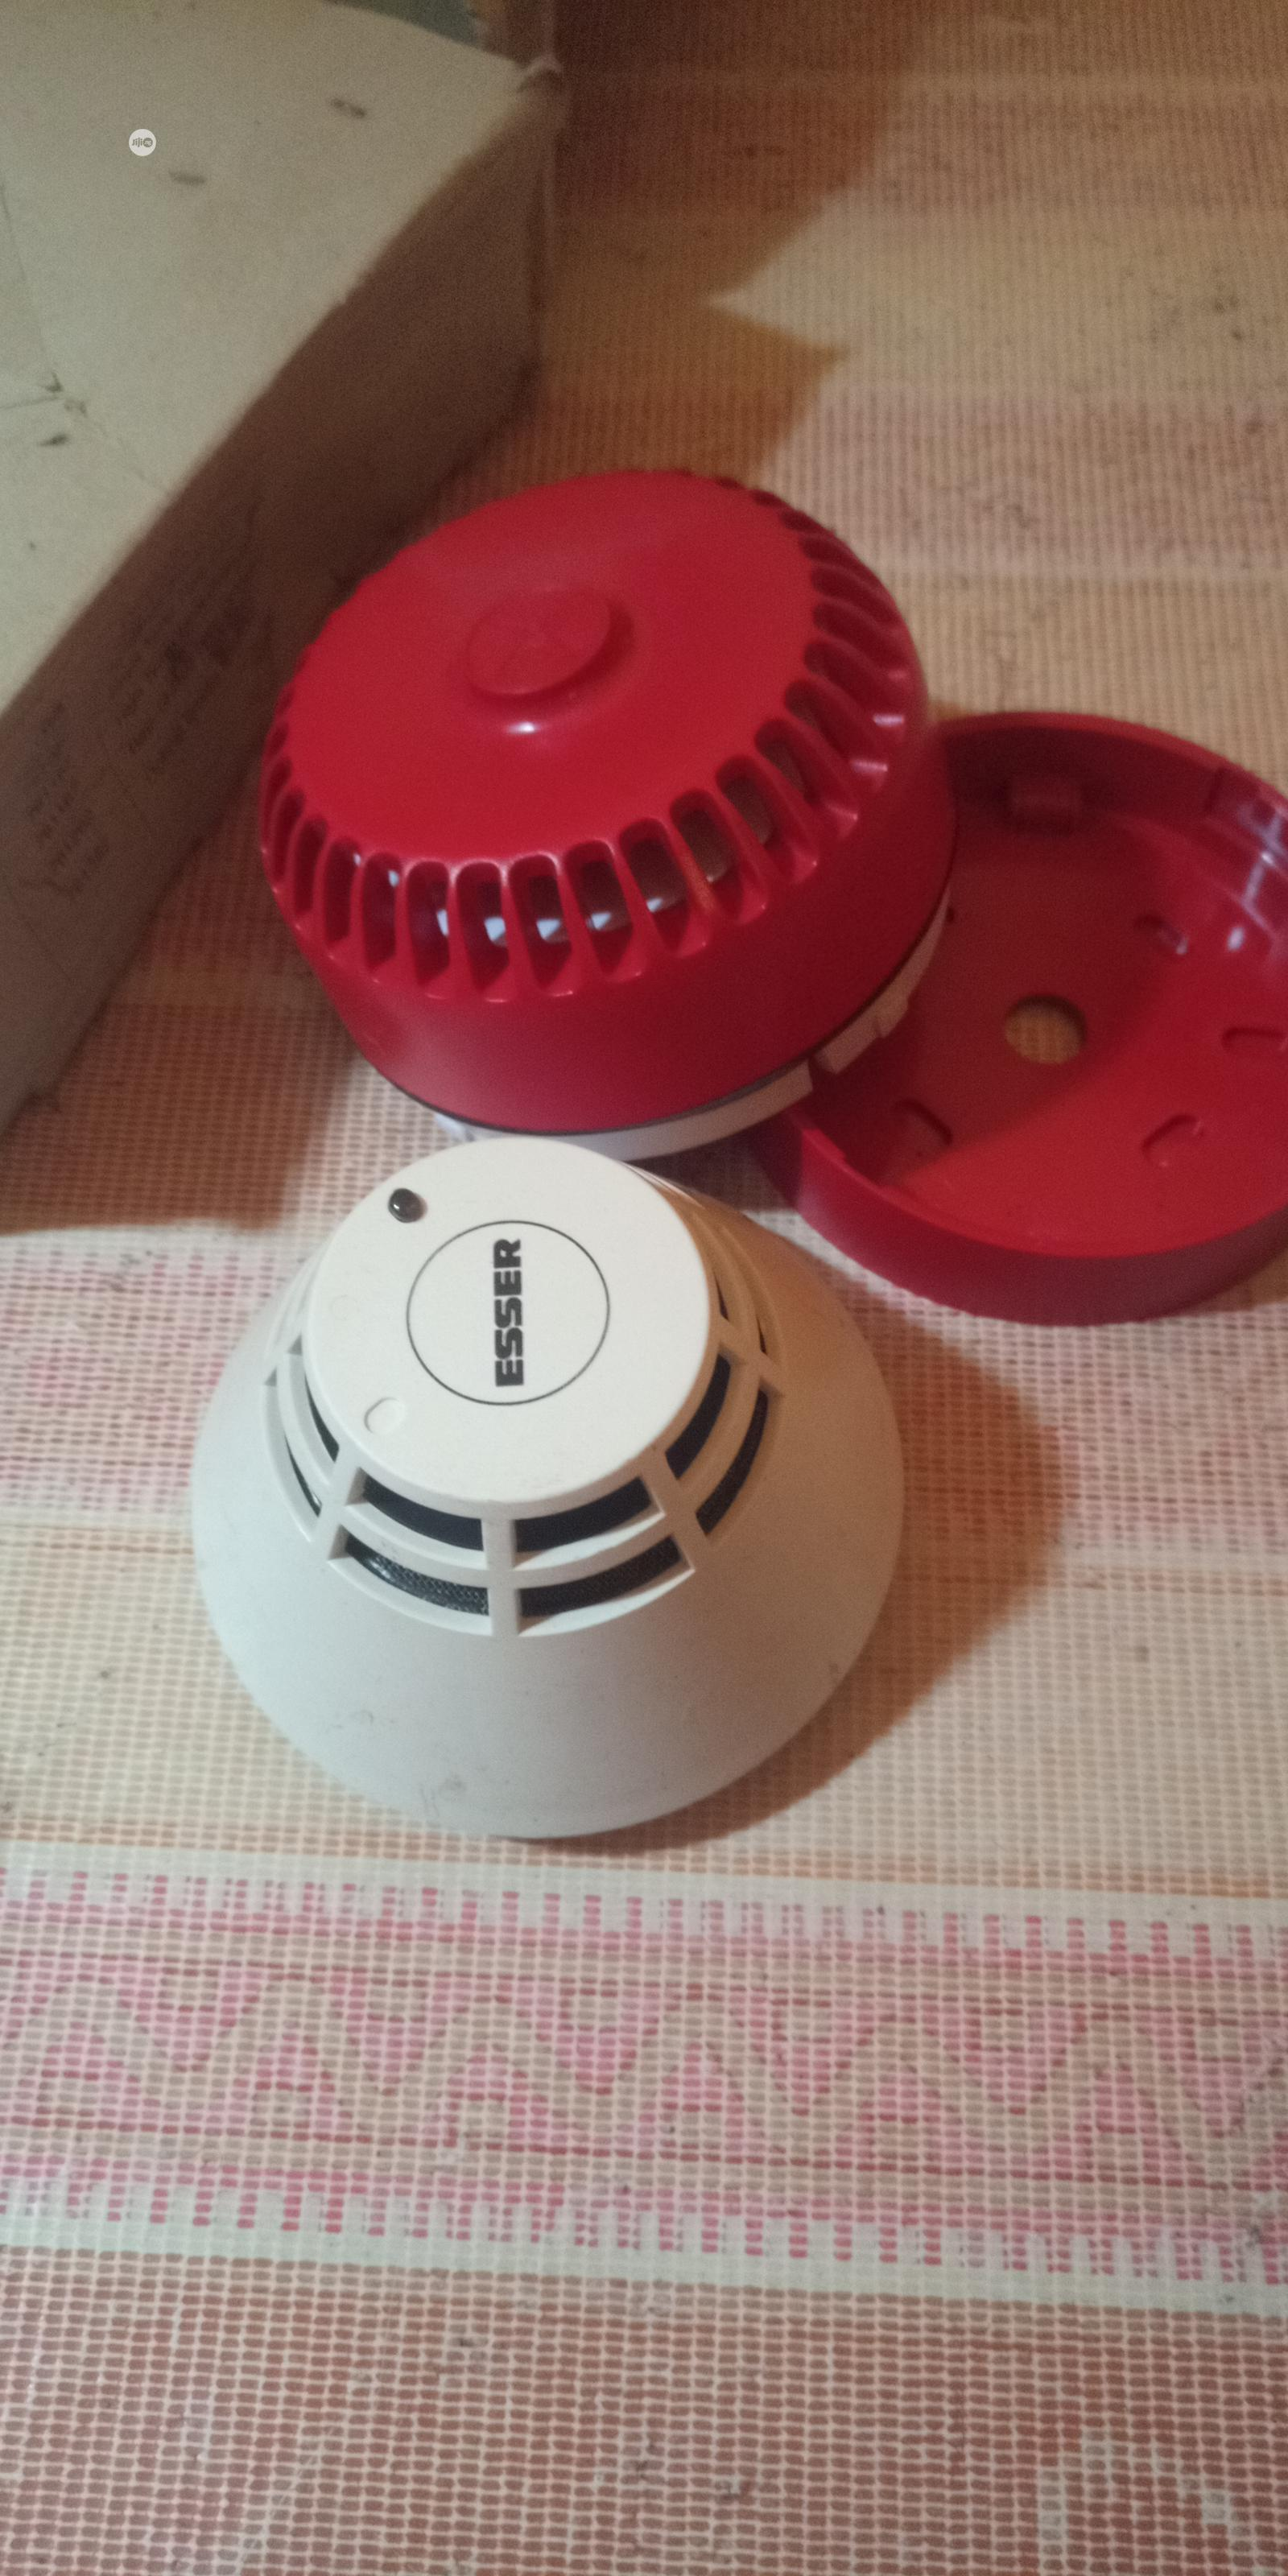 Archive: Smoke Detector/Alarm